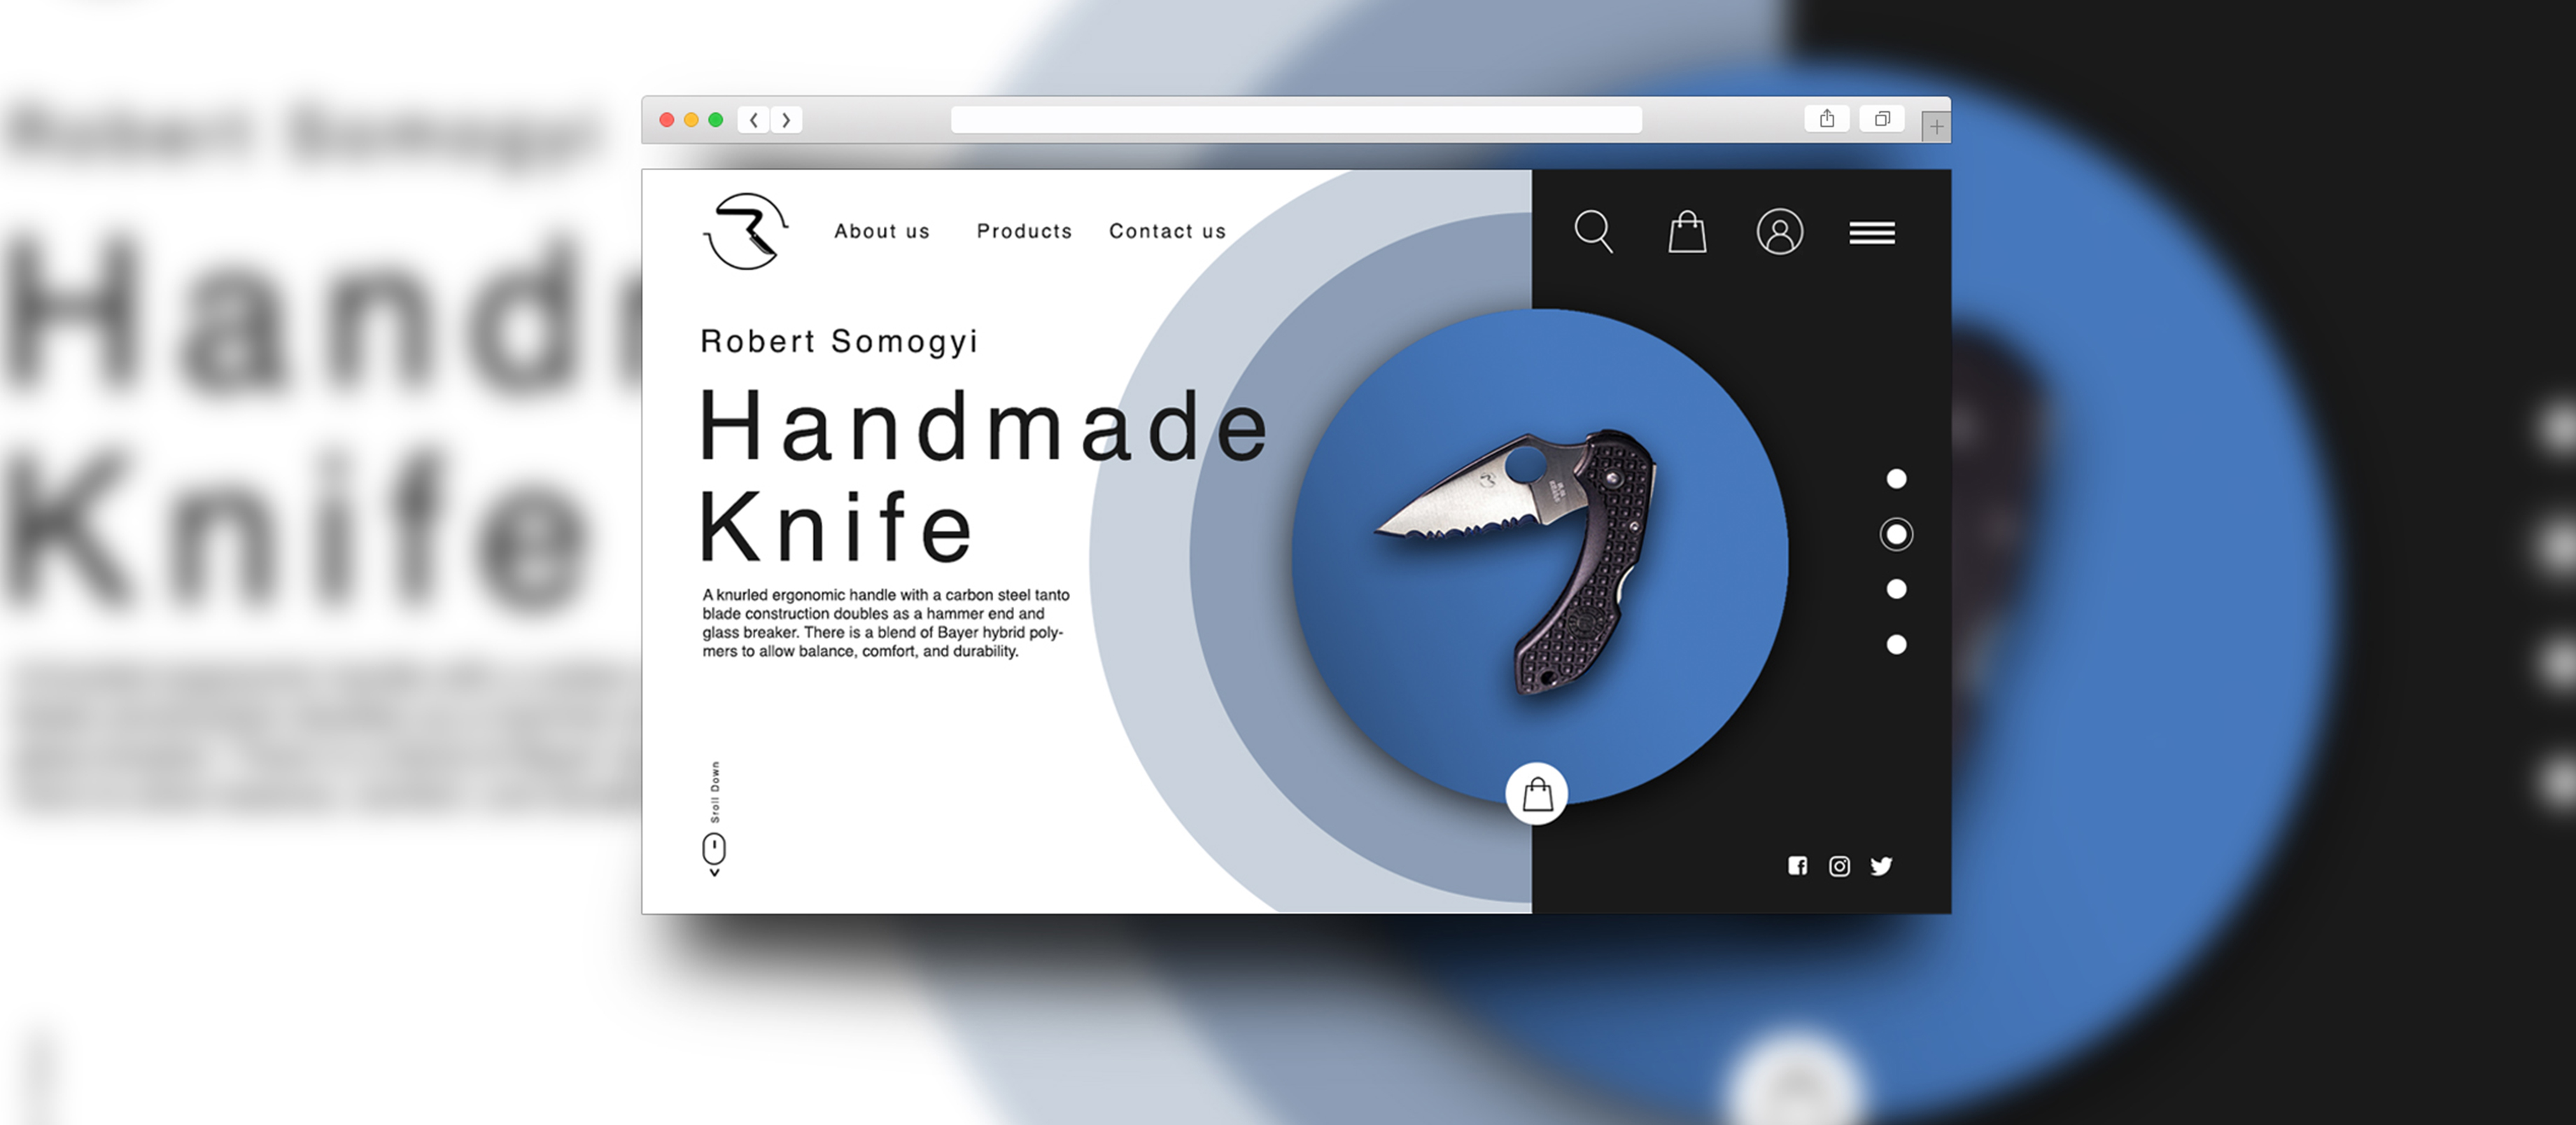 Handmade knife ui/ux desing